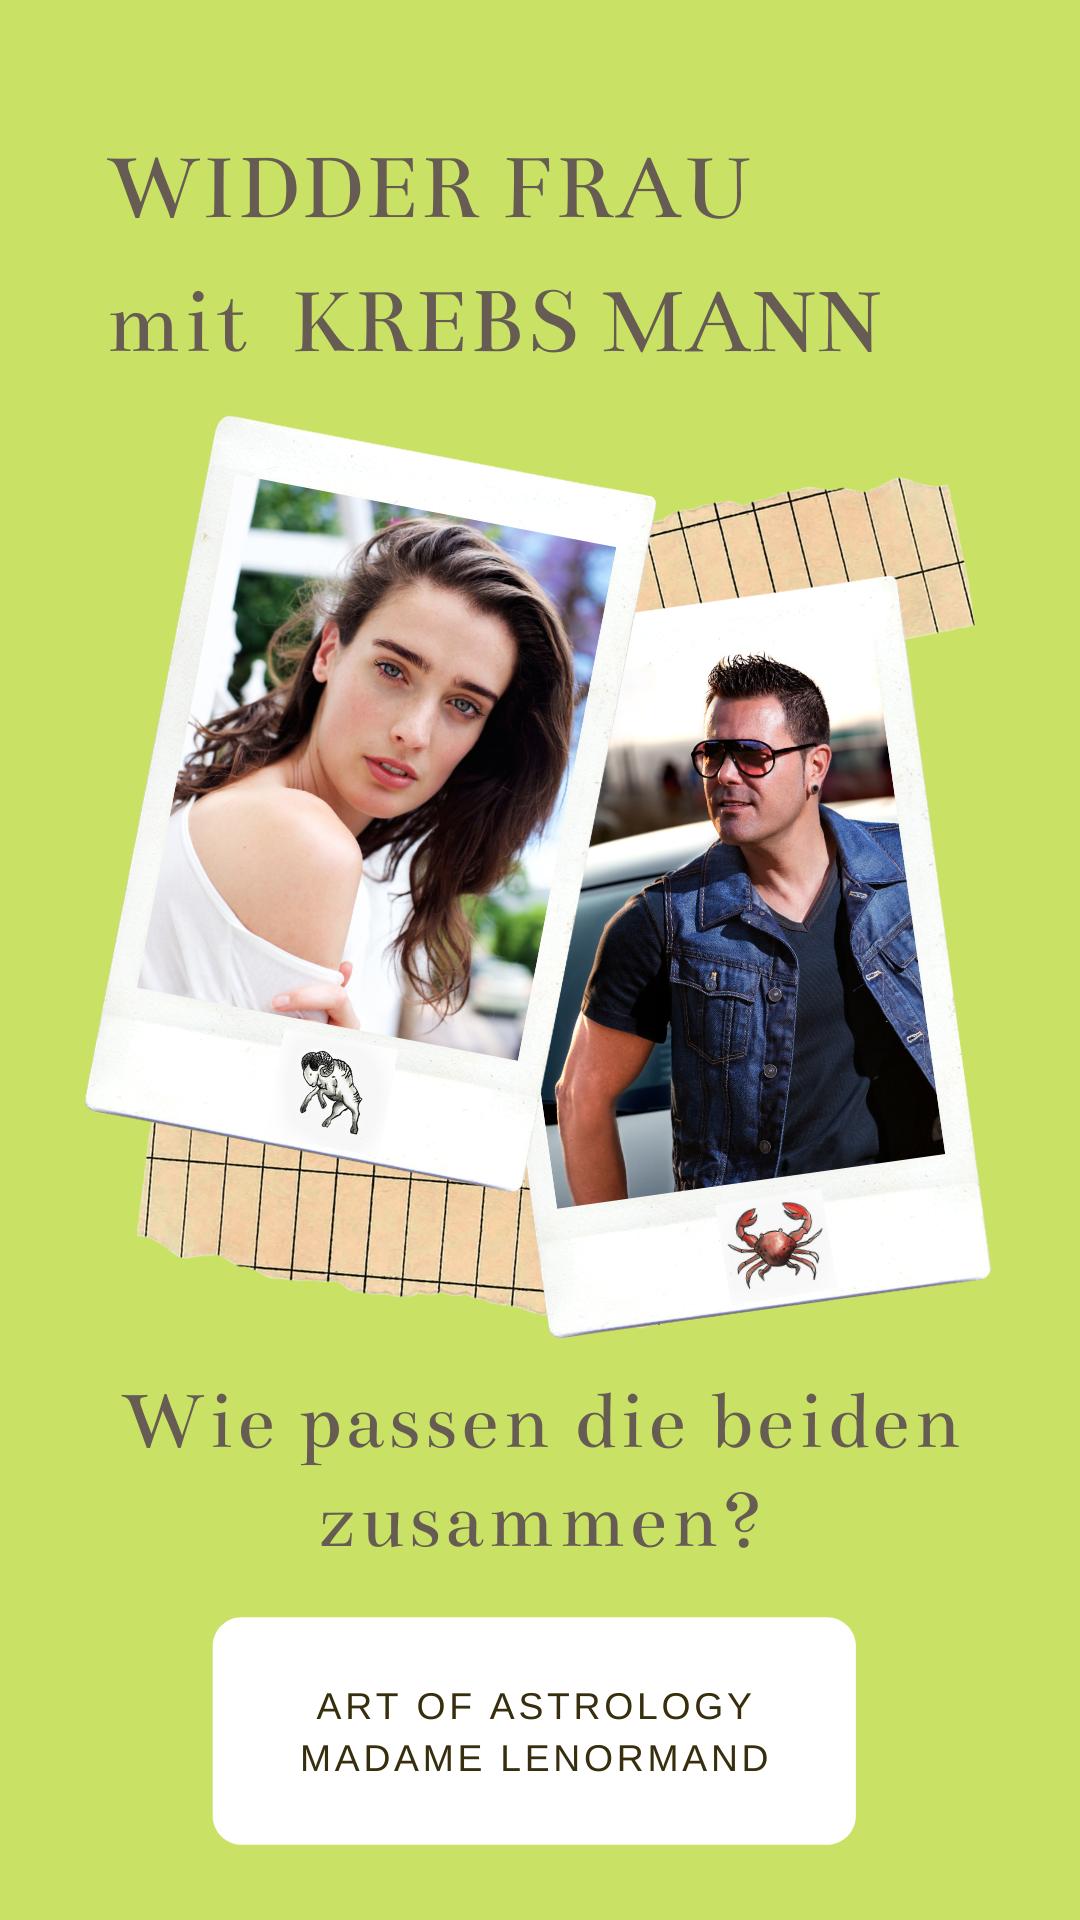 Sternzeichen Widder Frau | Widder frau, Krebs mann, Widder